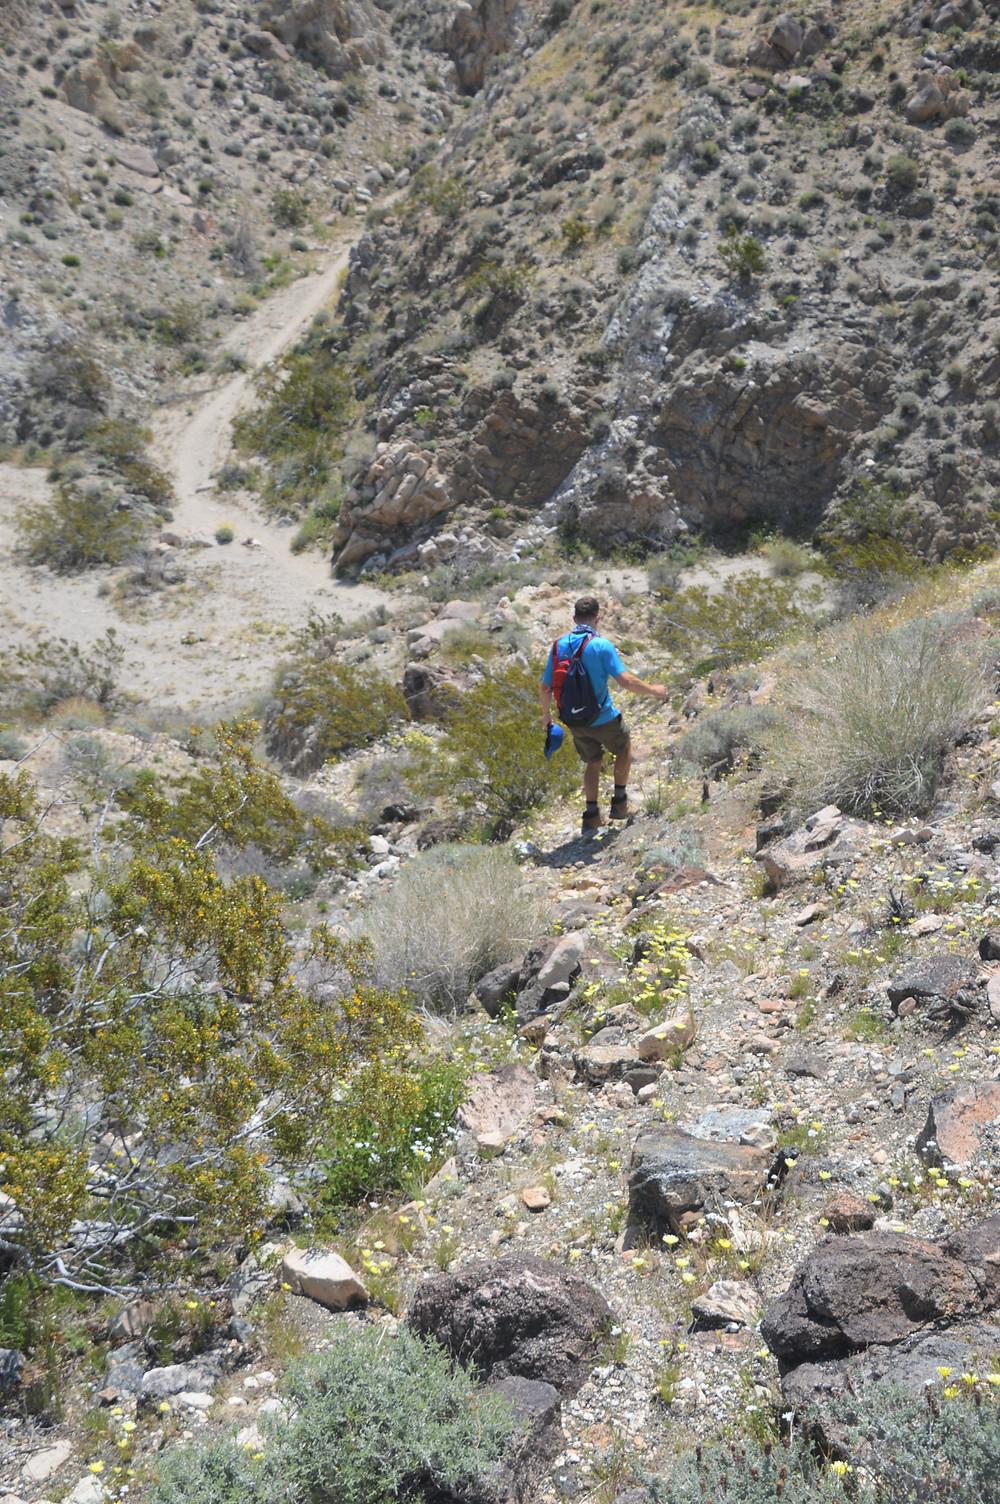 Descending from Chocolate Drop Hill in the Little San Bernardino Mountains